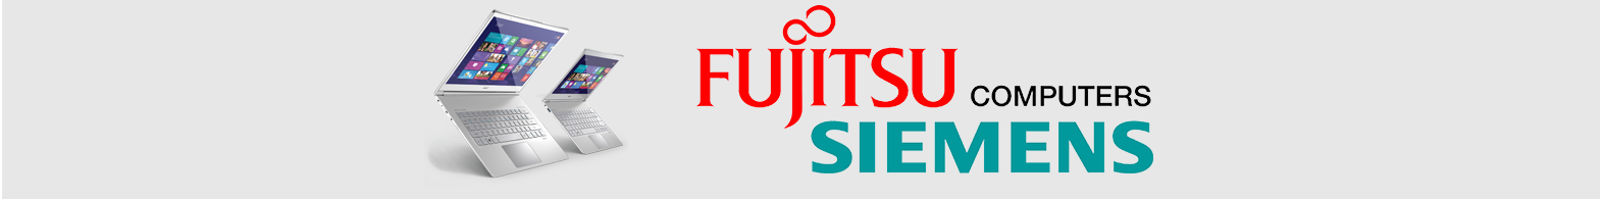 Fujitsu Siemens 1600x200